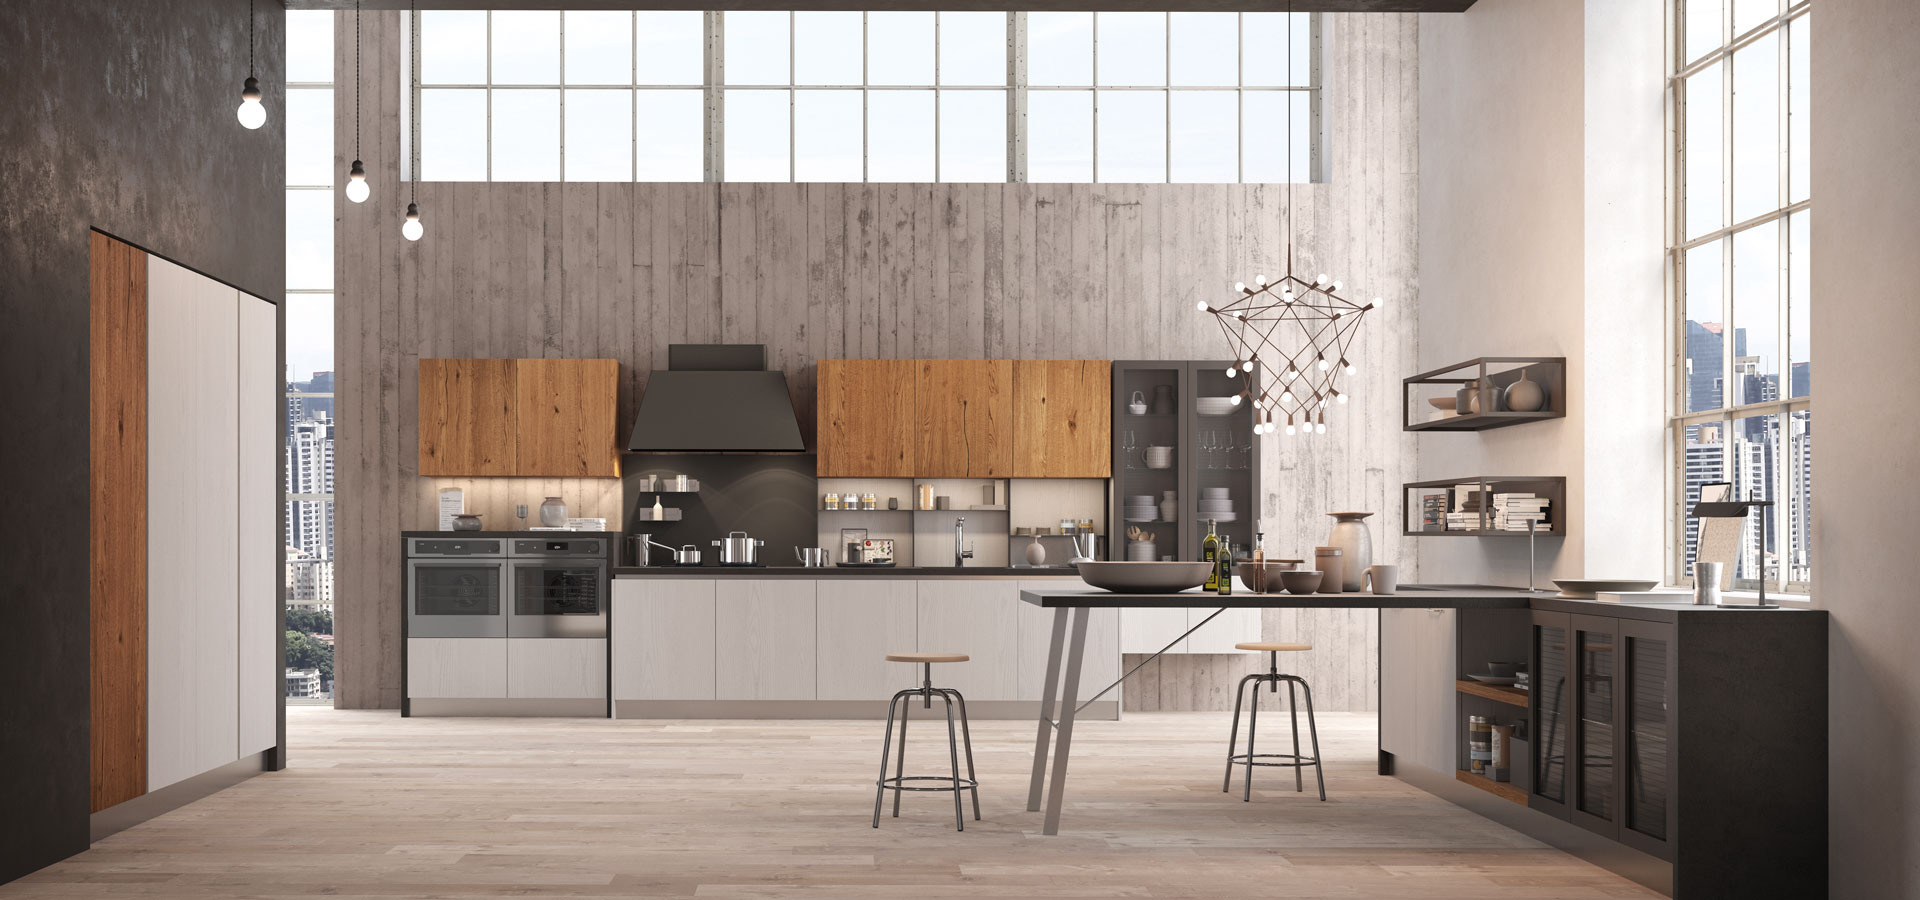 Asia factory modern kitchen arredo3 for Cucine arredo tre